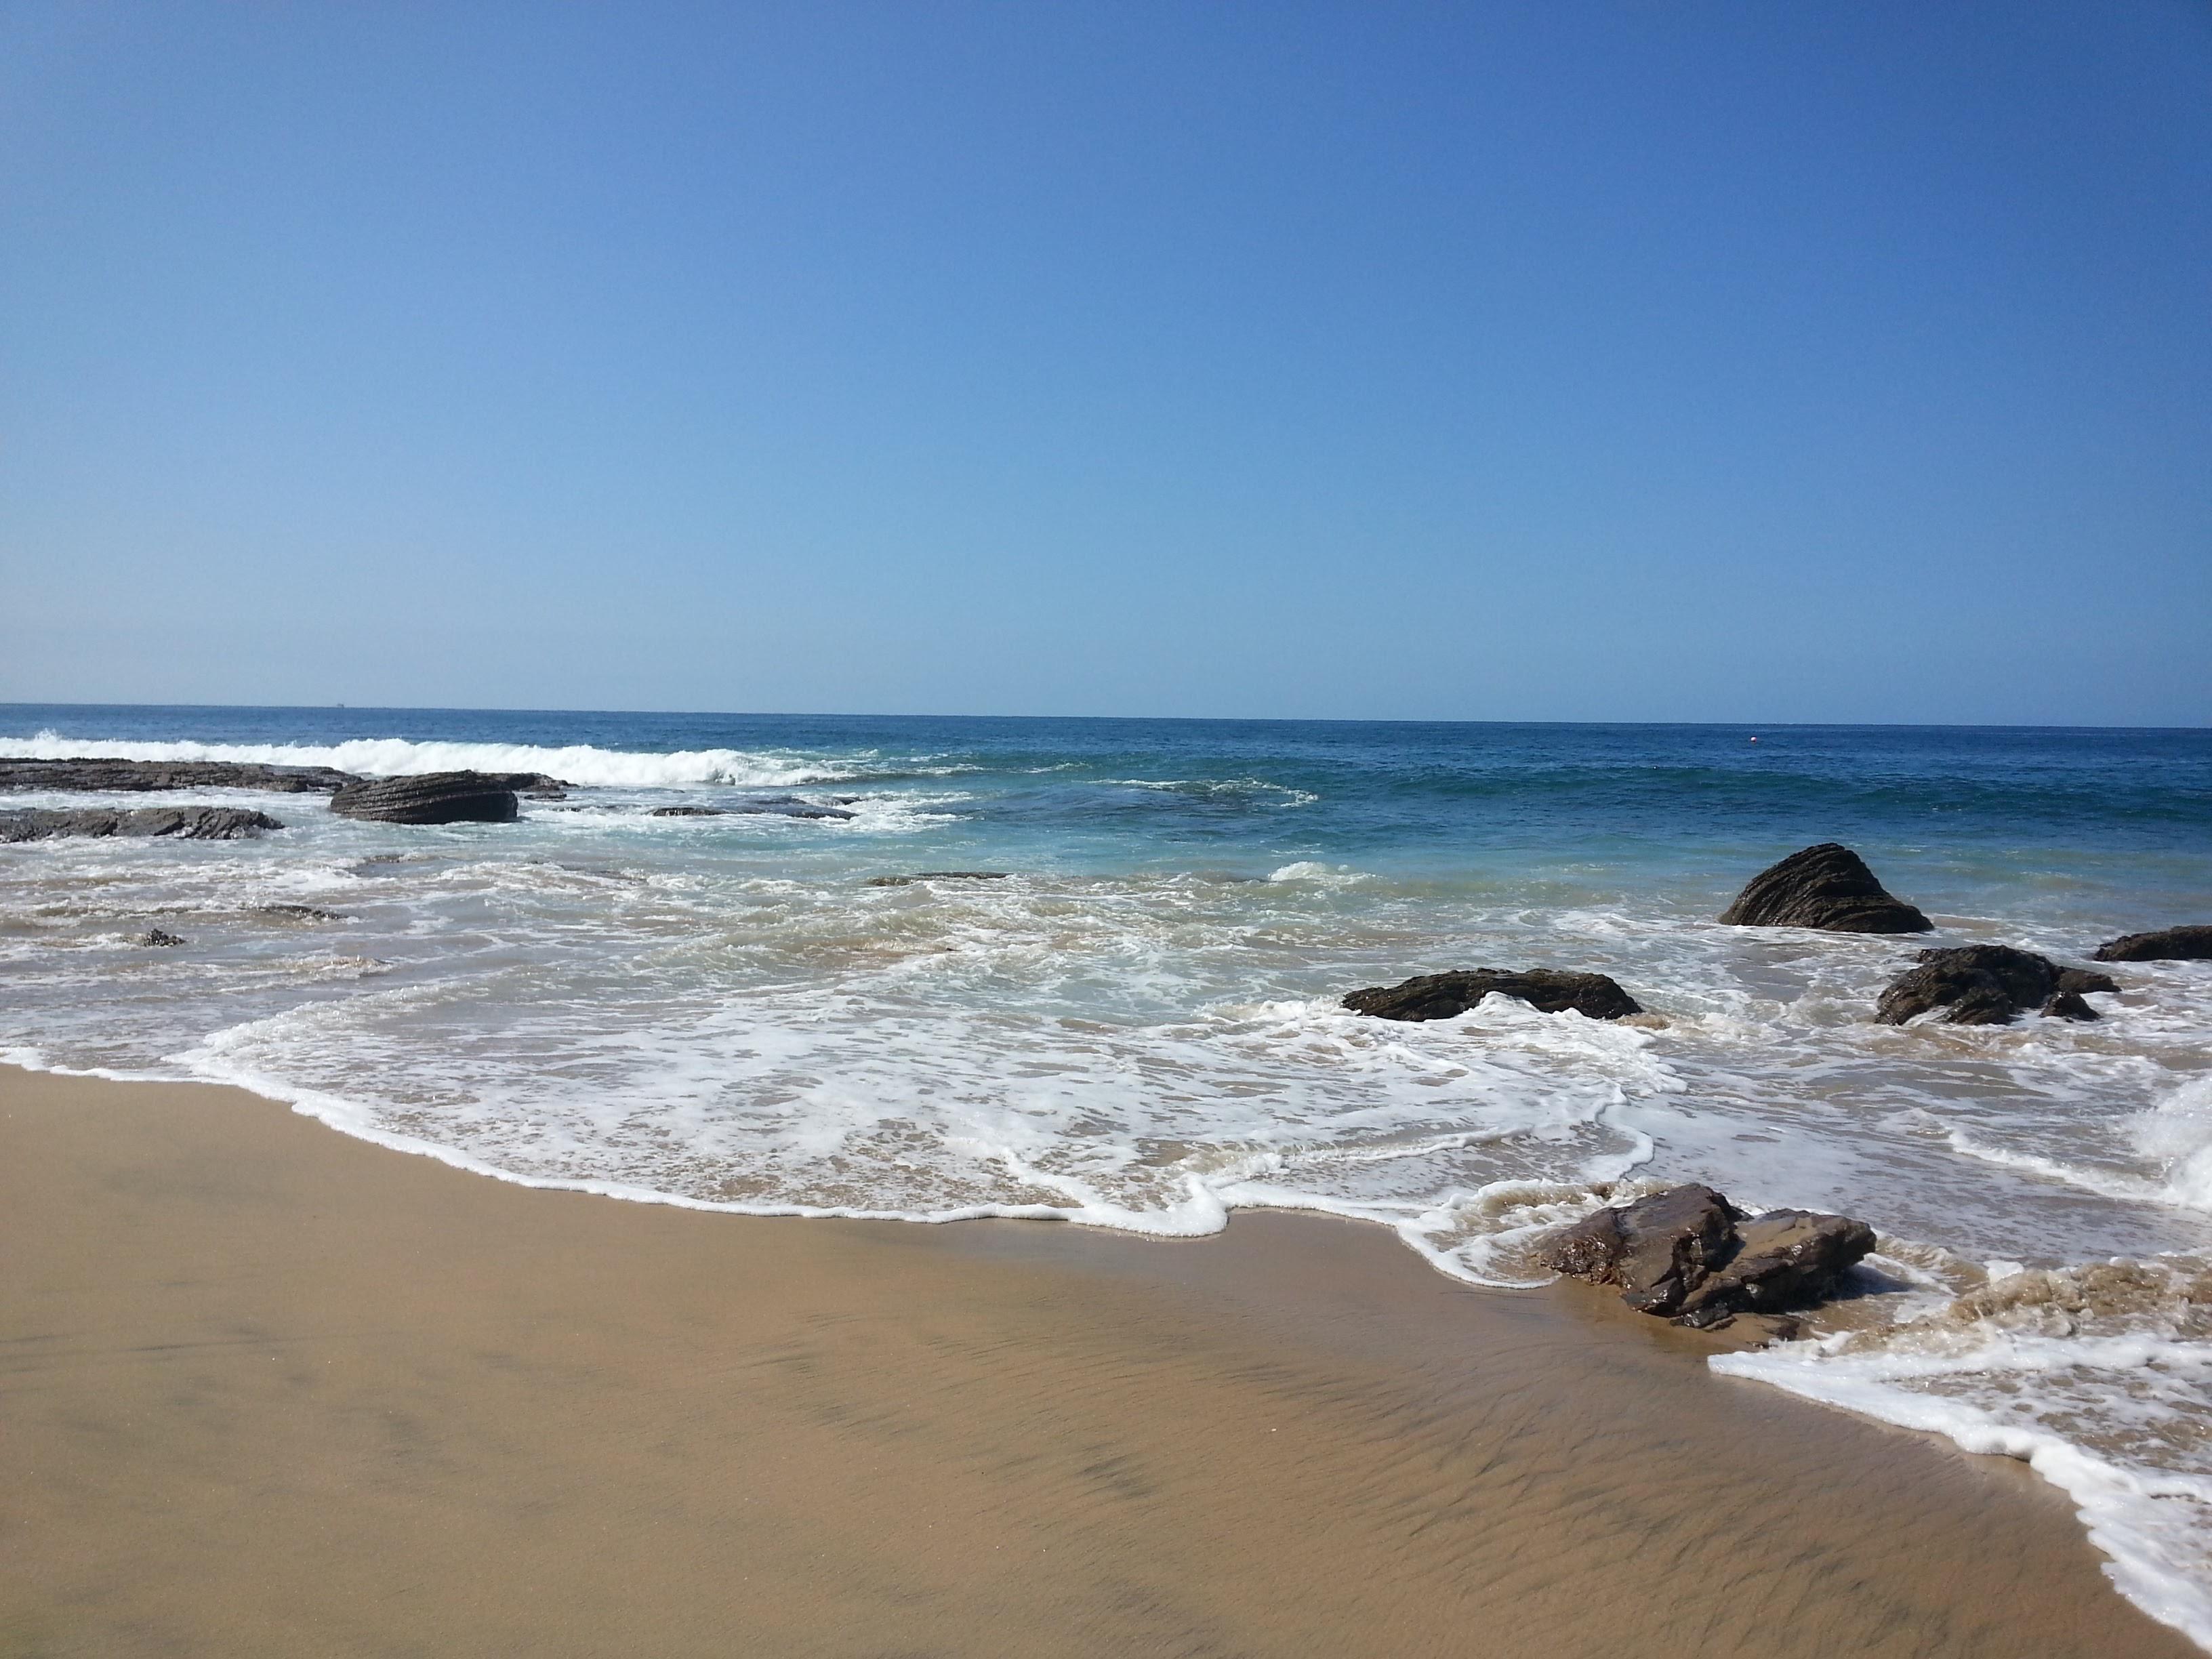 Waves breaking on sand